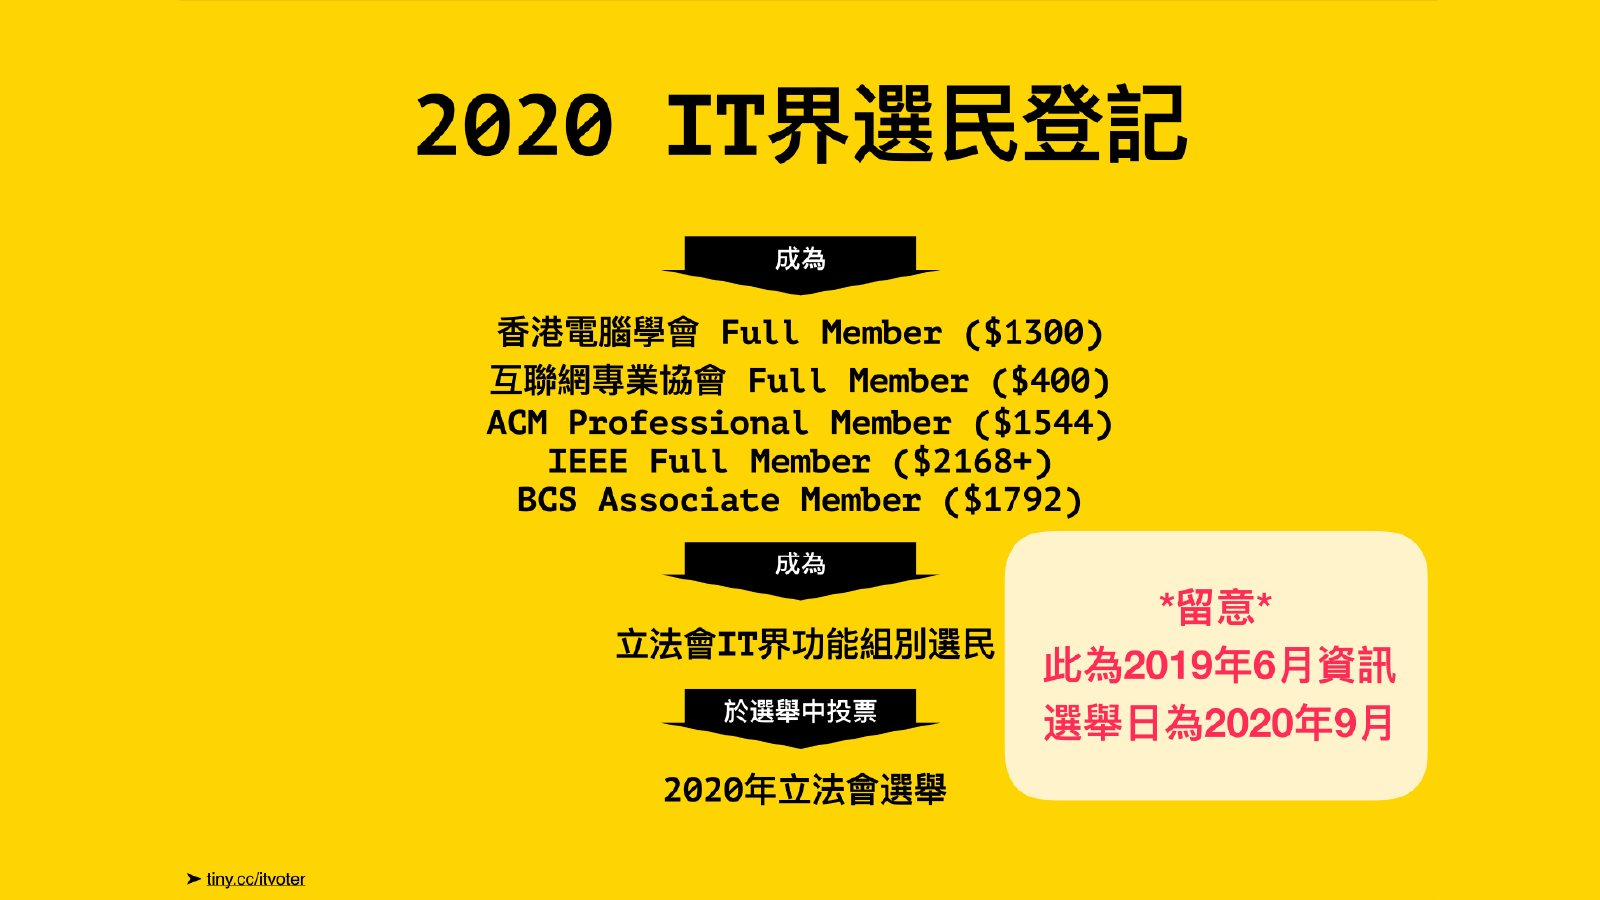 2020 IT界選民登記